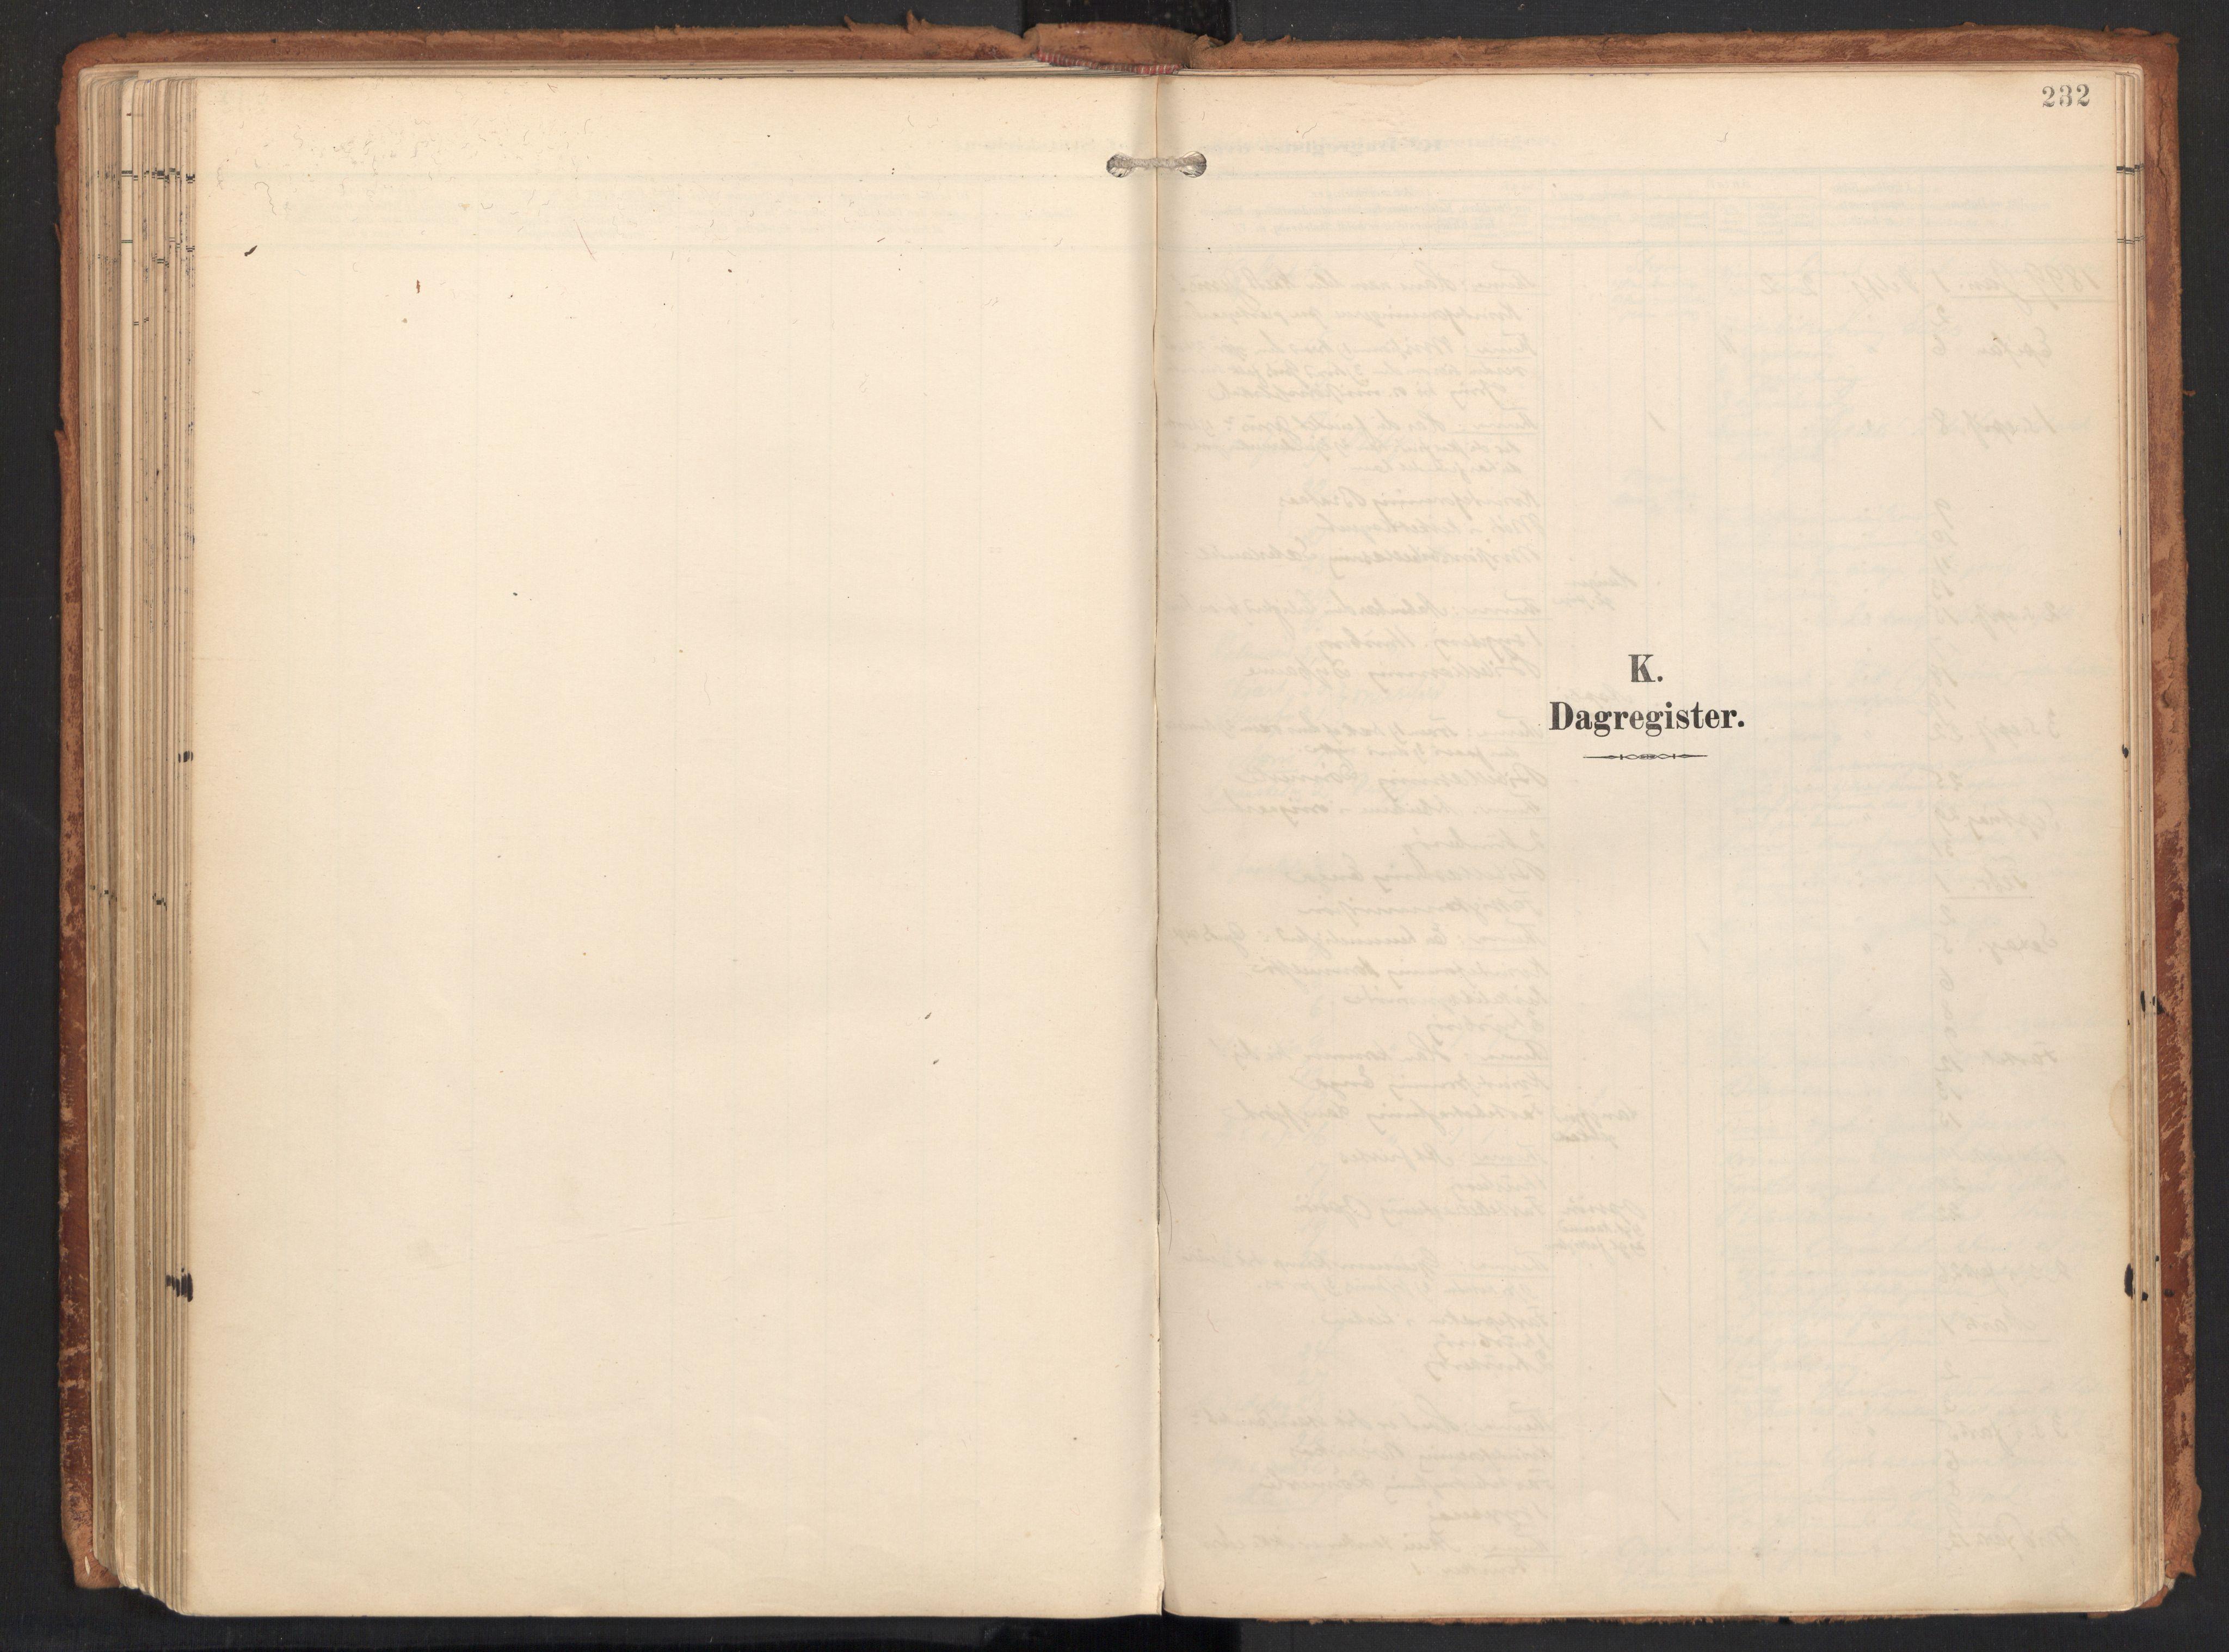 SAT, Ministerialprotokoller, klokkerbøker og fødselsregistre - Nordland, 814/L0227: Ministerialbok nr. 814A08, 1899-1920, s. 232